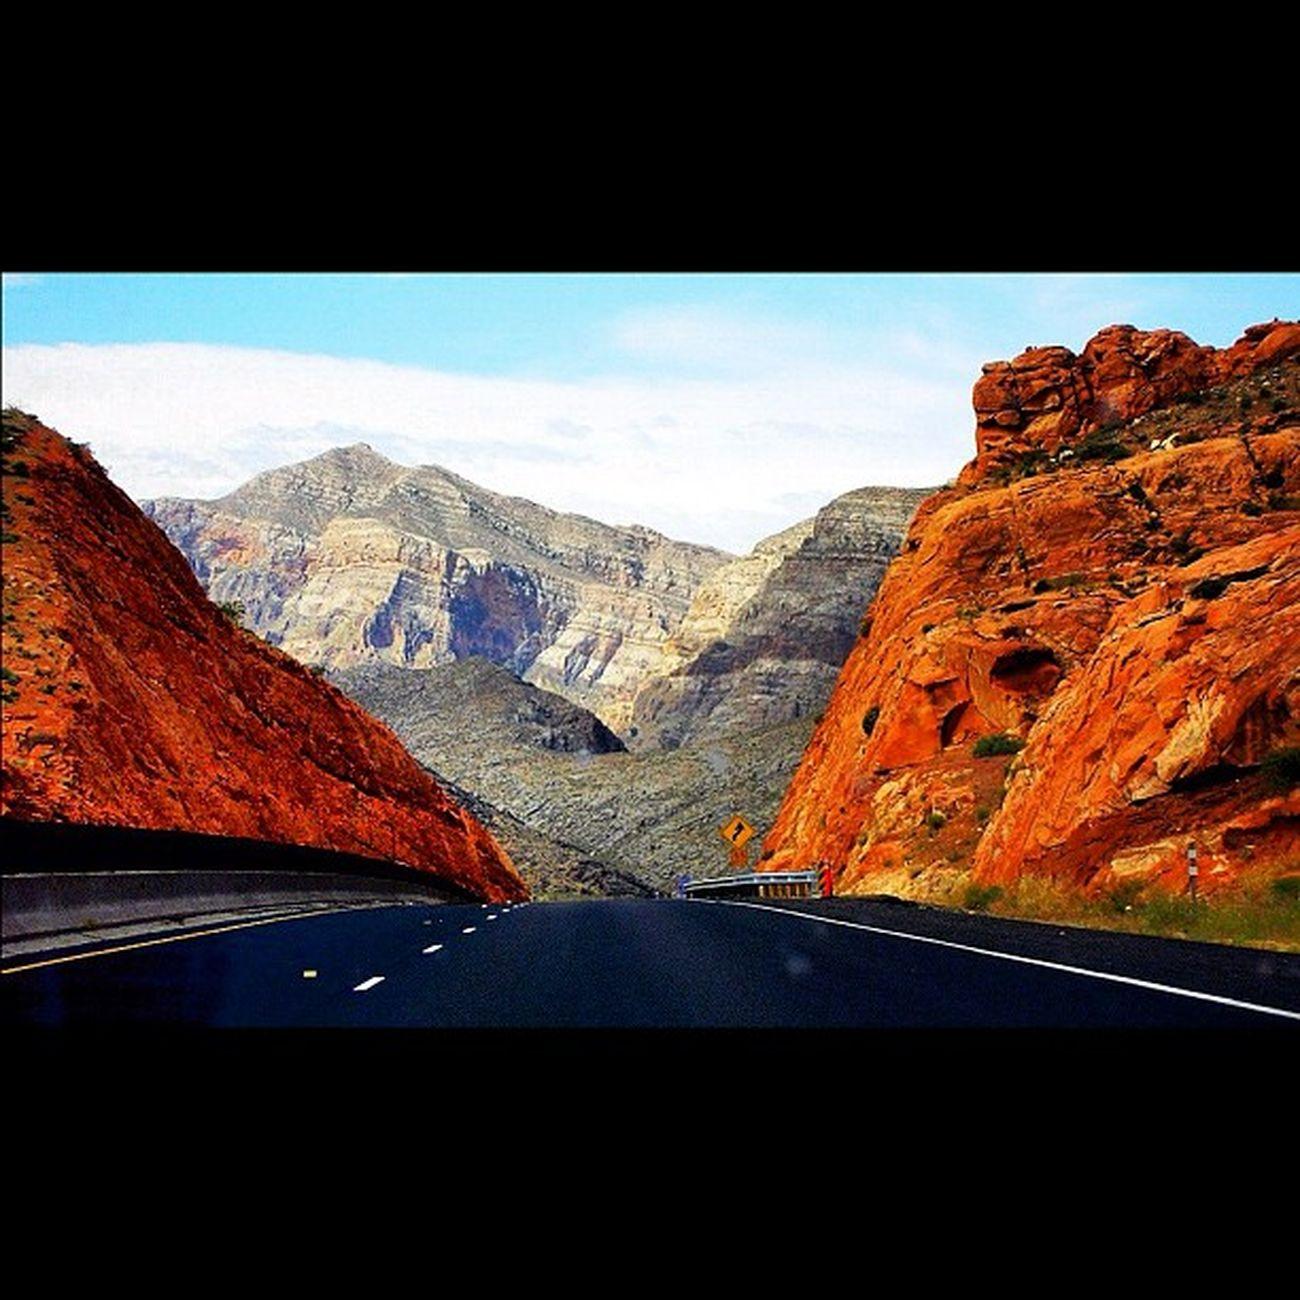 Arizona #arizona #honkTravel Arizona Honktravel